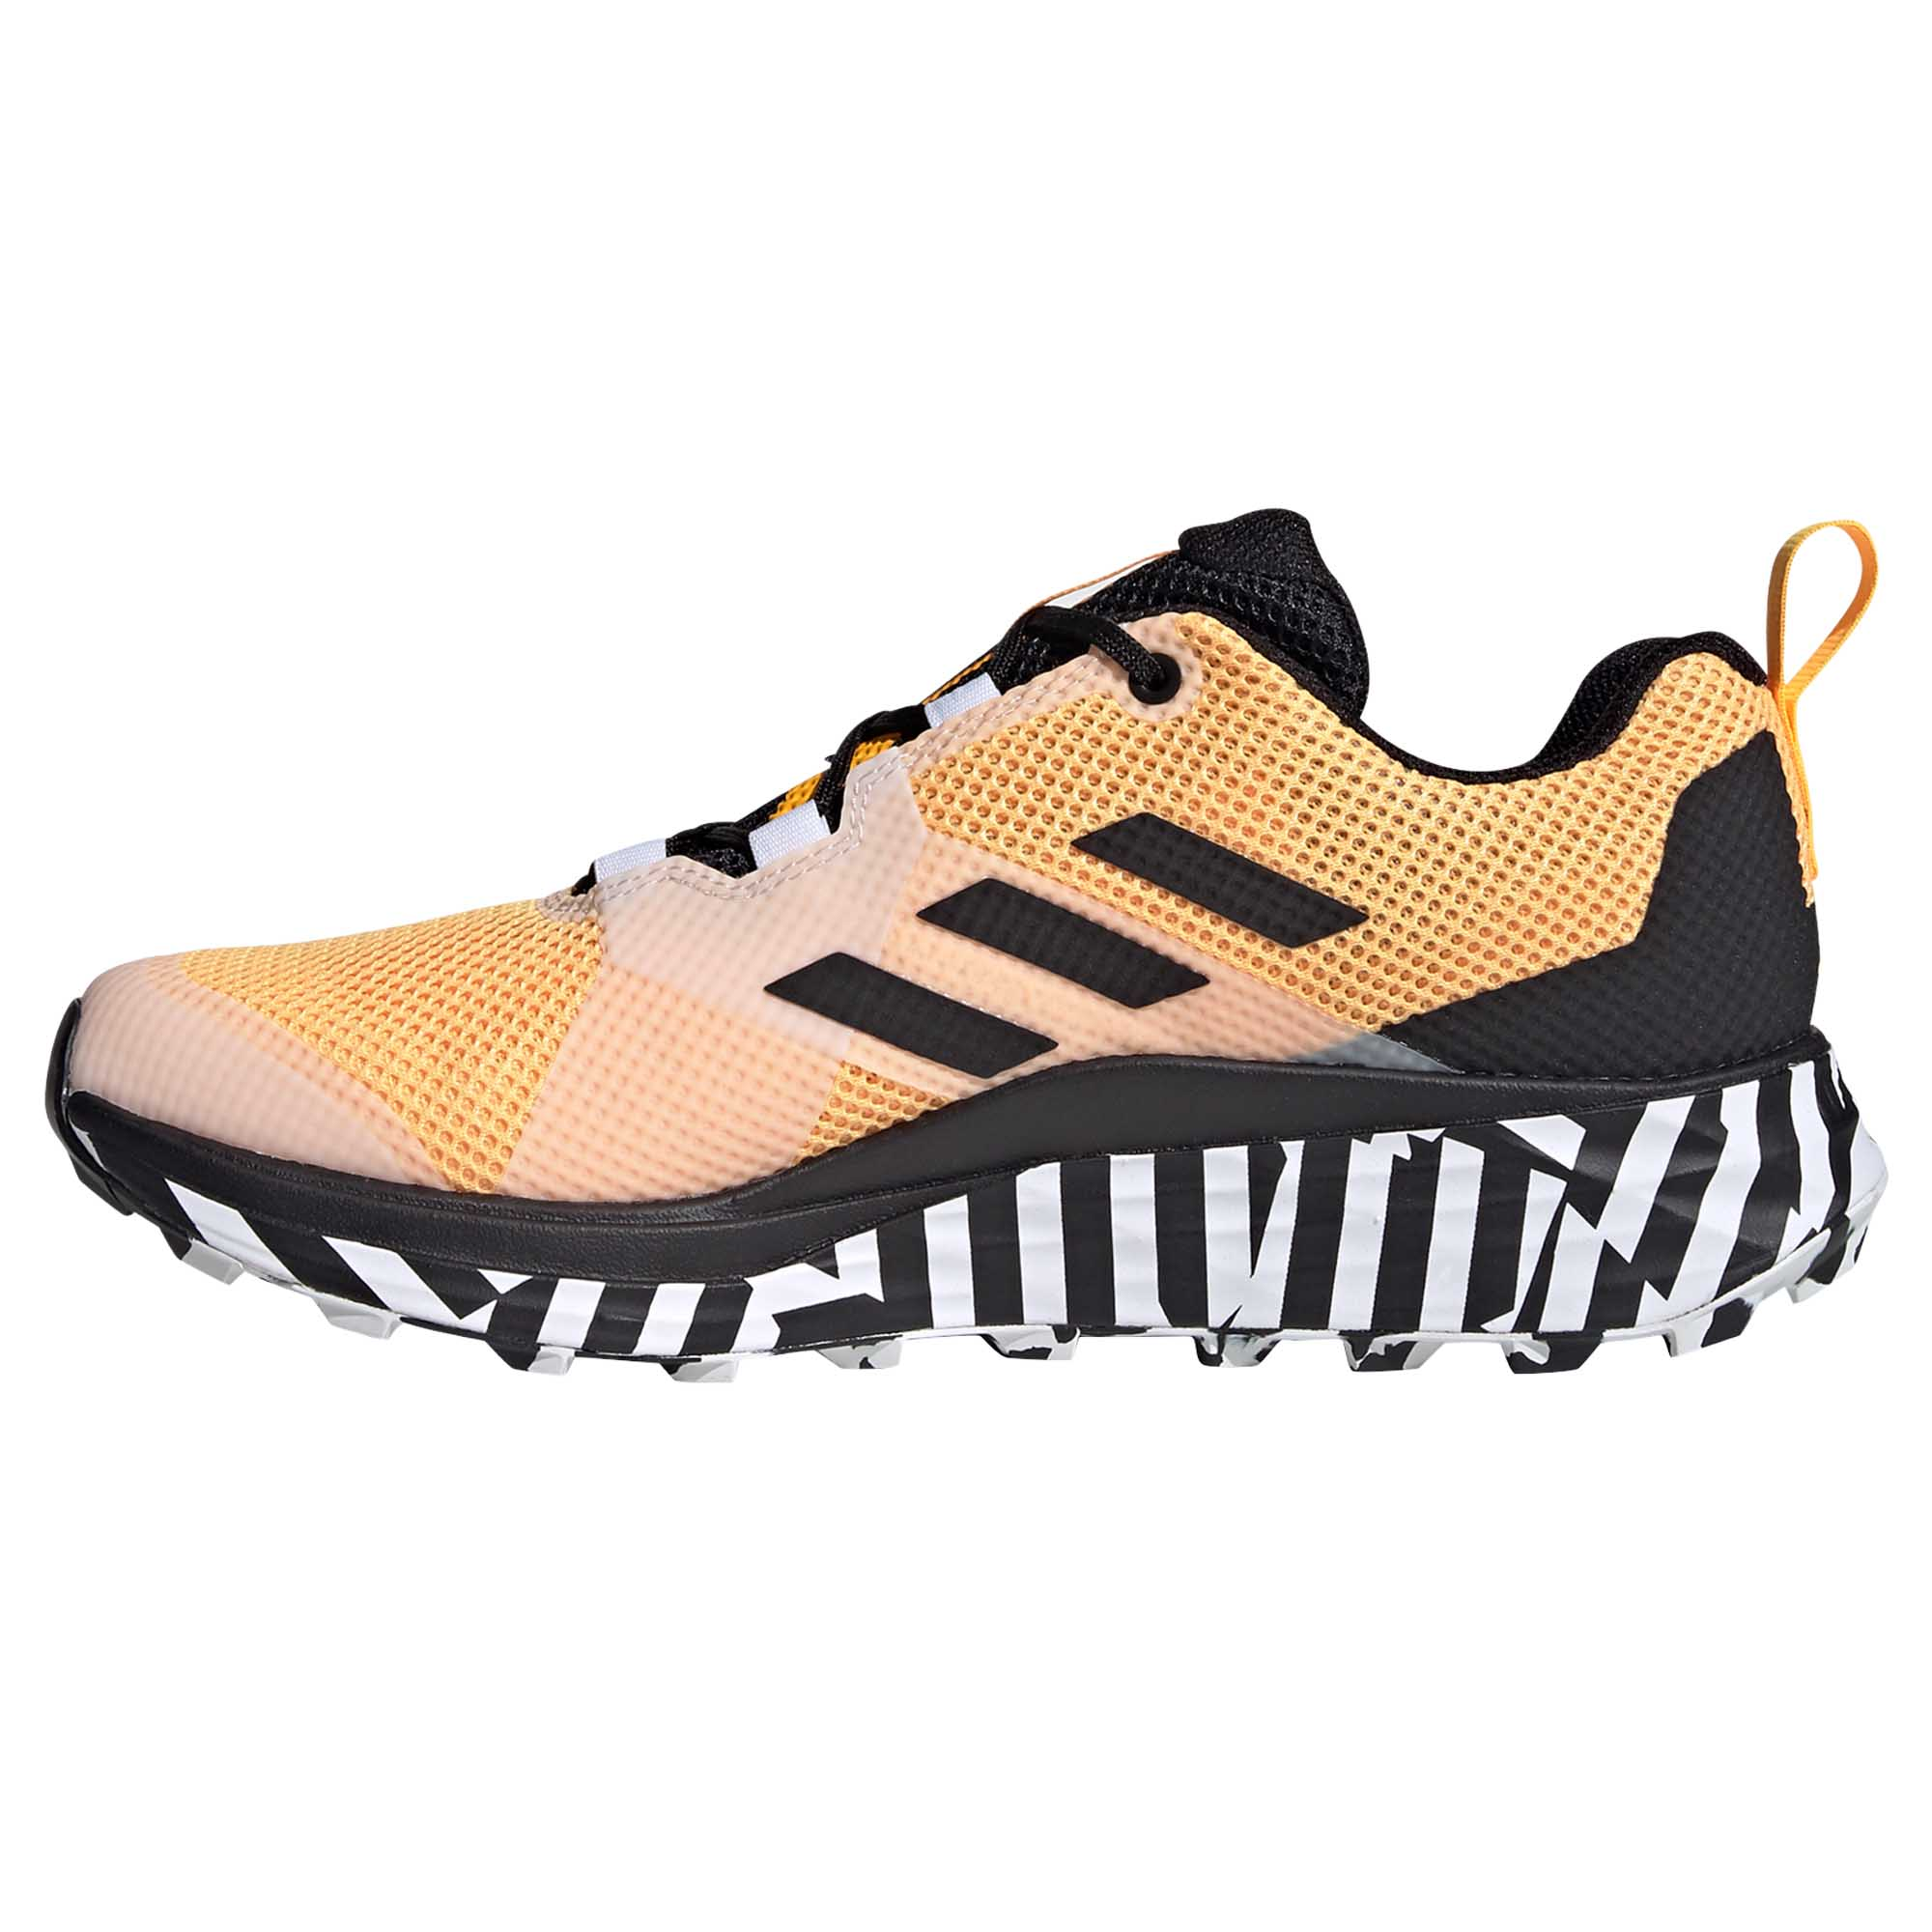 miniature 8 - Adidas-Terrex-deux-homme-trail-running-Trainer-Shoe-Or-Noir-Blanc